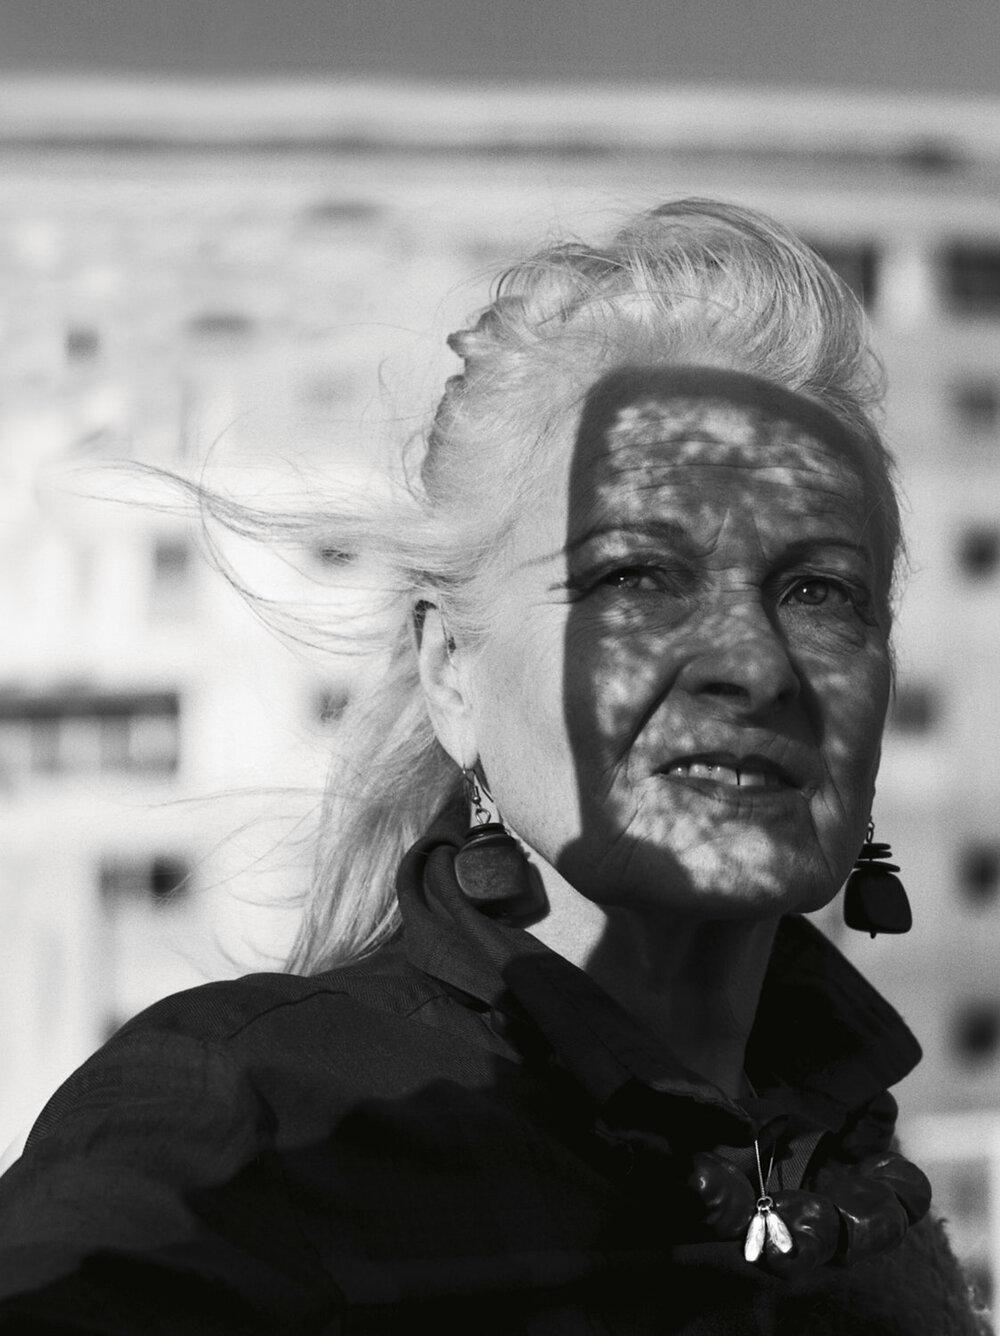 Vivienne Westwood by Jack Davison